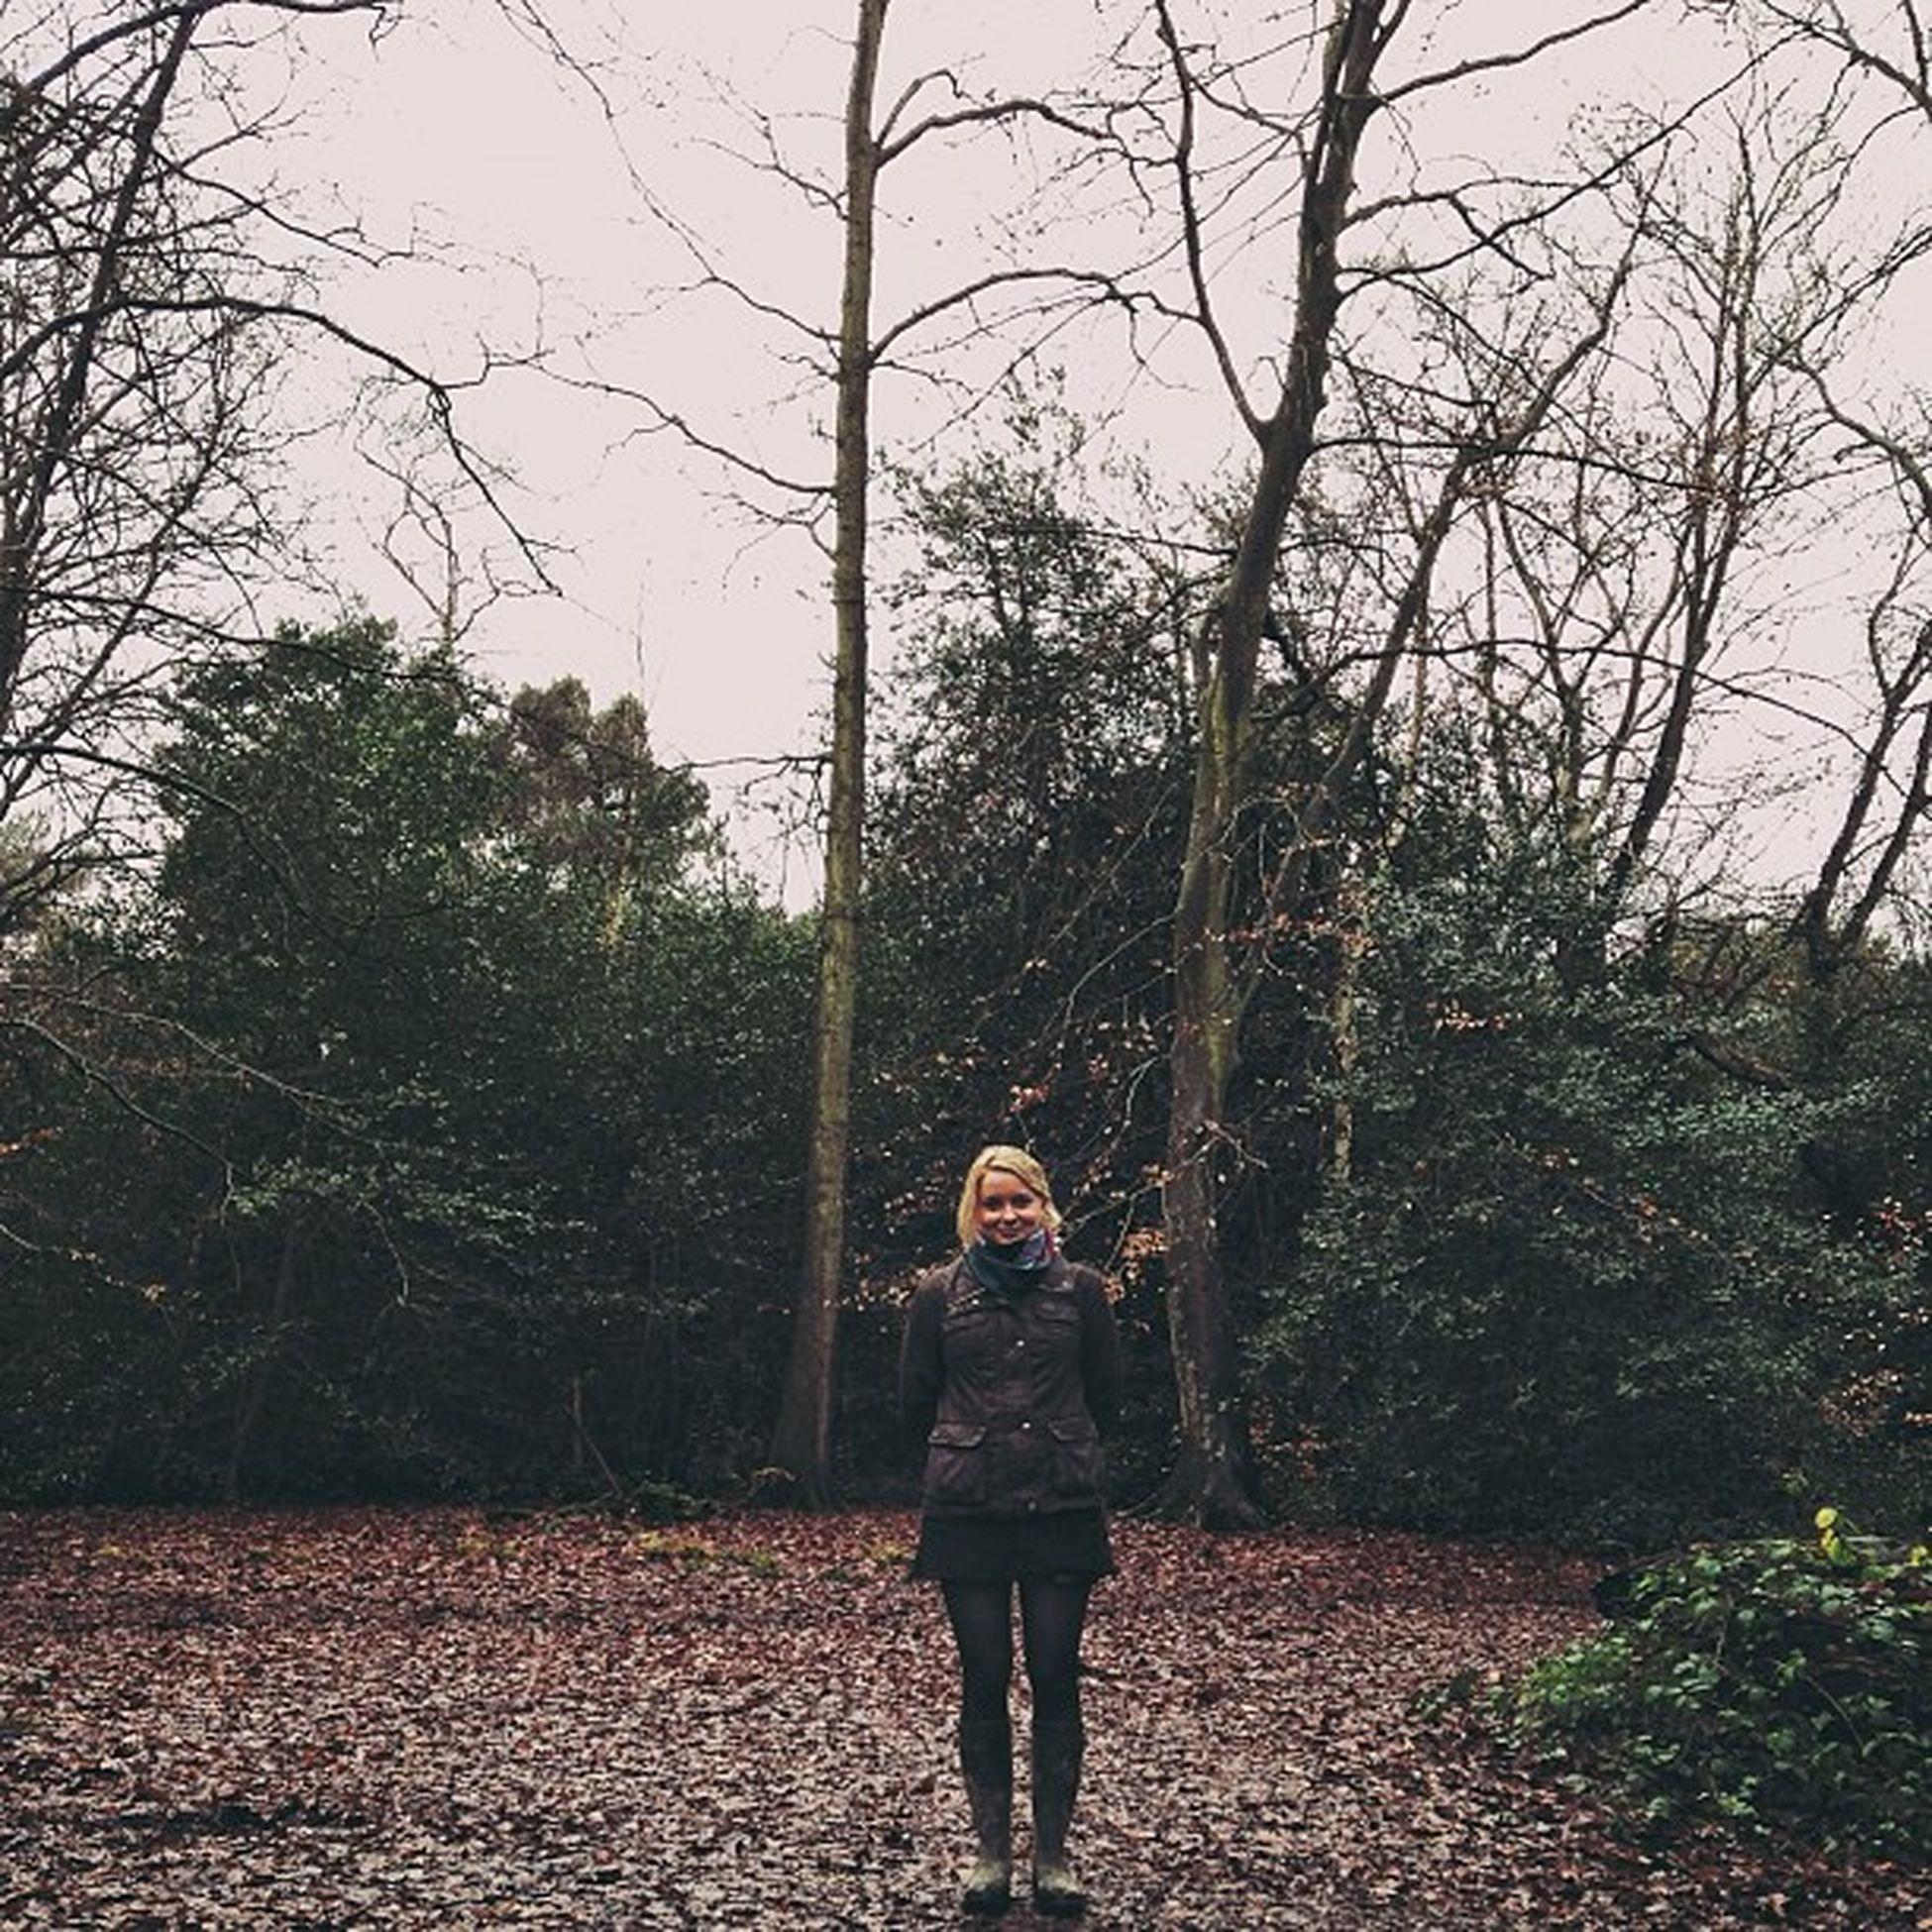 Christmas walk with my carysmoore #woods #walk #winter #leaves #trees #keston #mobilephotography #tinyshutter #ampt_community #igerslondon #igers #instagramers #instagood #photoftheday #picoftheday #instadaily Tinyshutter Keston Walk Trees Leaves Winter Woods Picoftheday Mobilephotography AMPt_community Igers Instagramers Instagood Instadaily Igerslondon Photoftheday